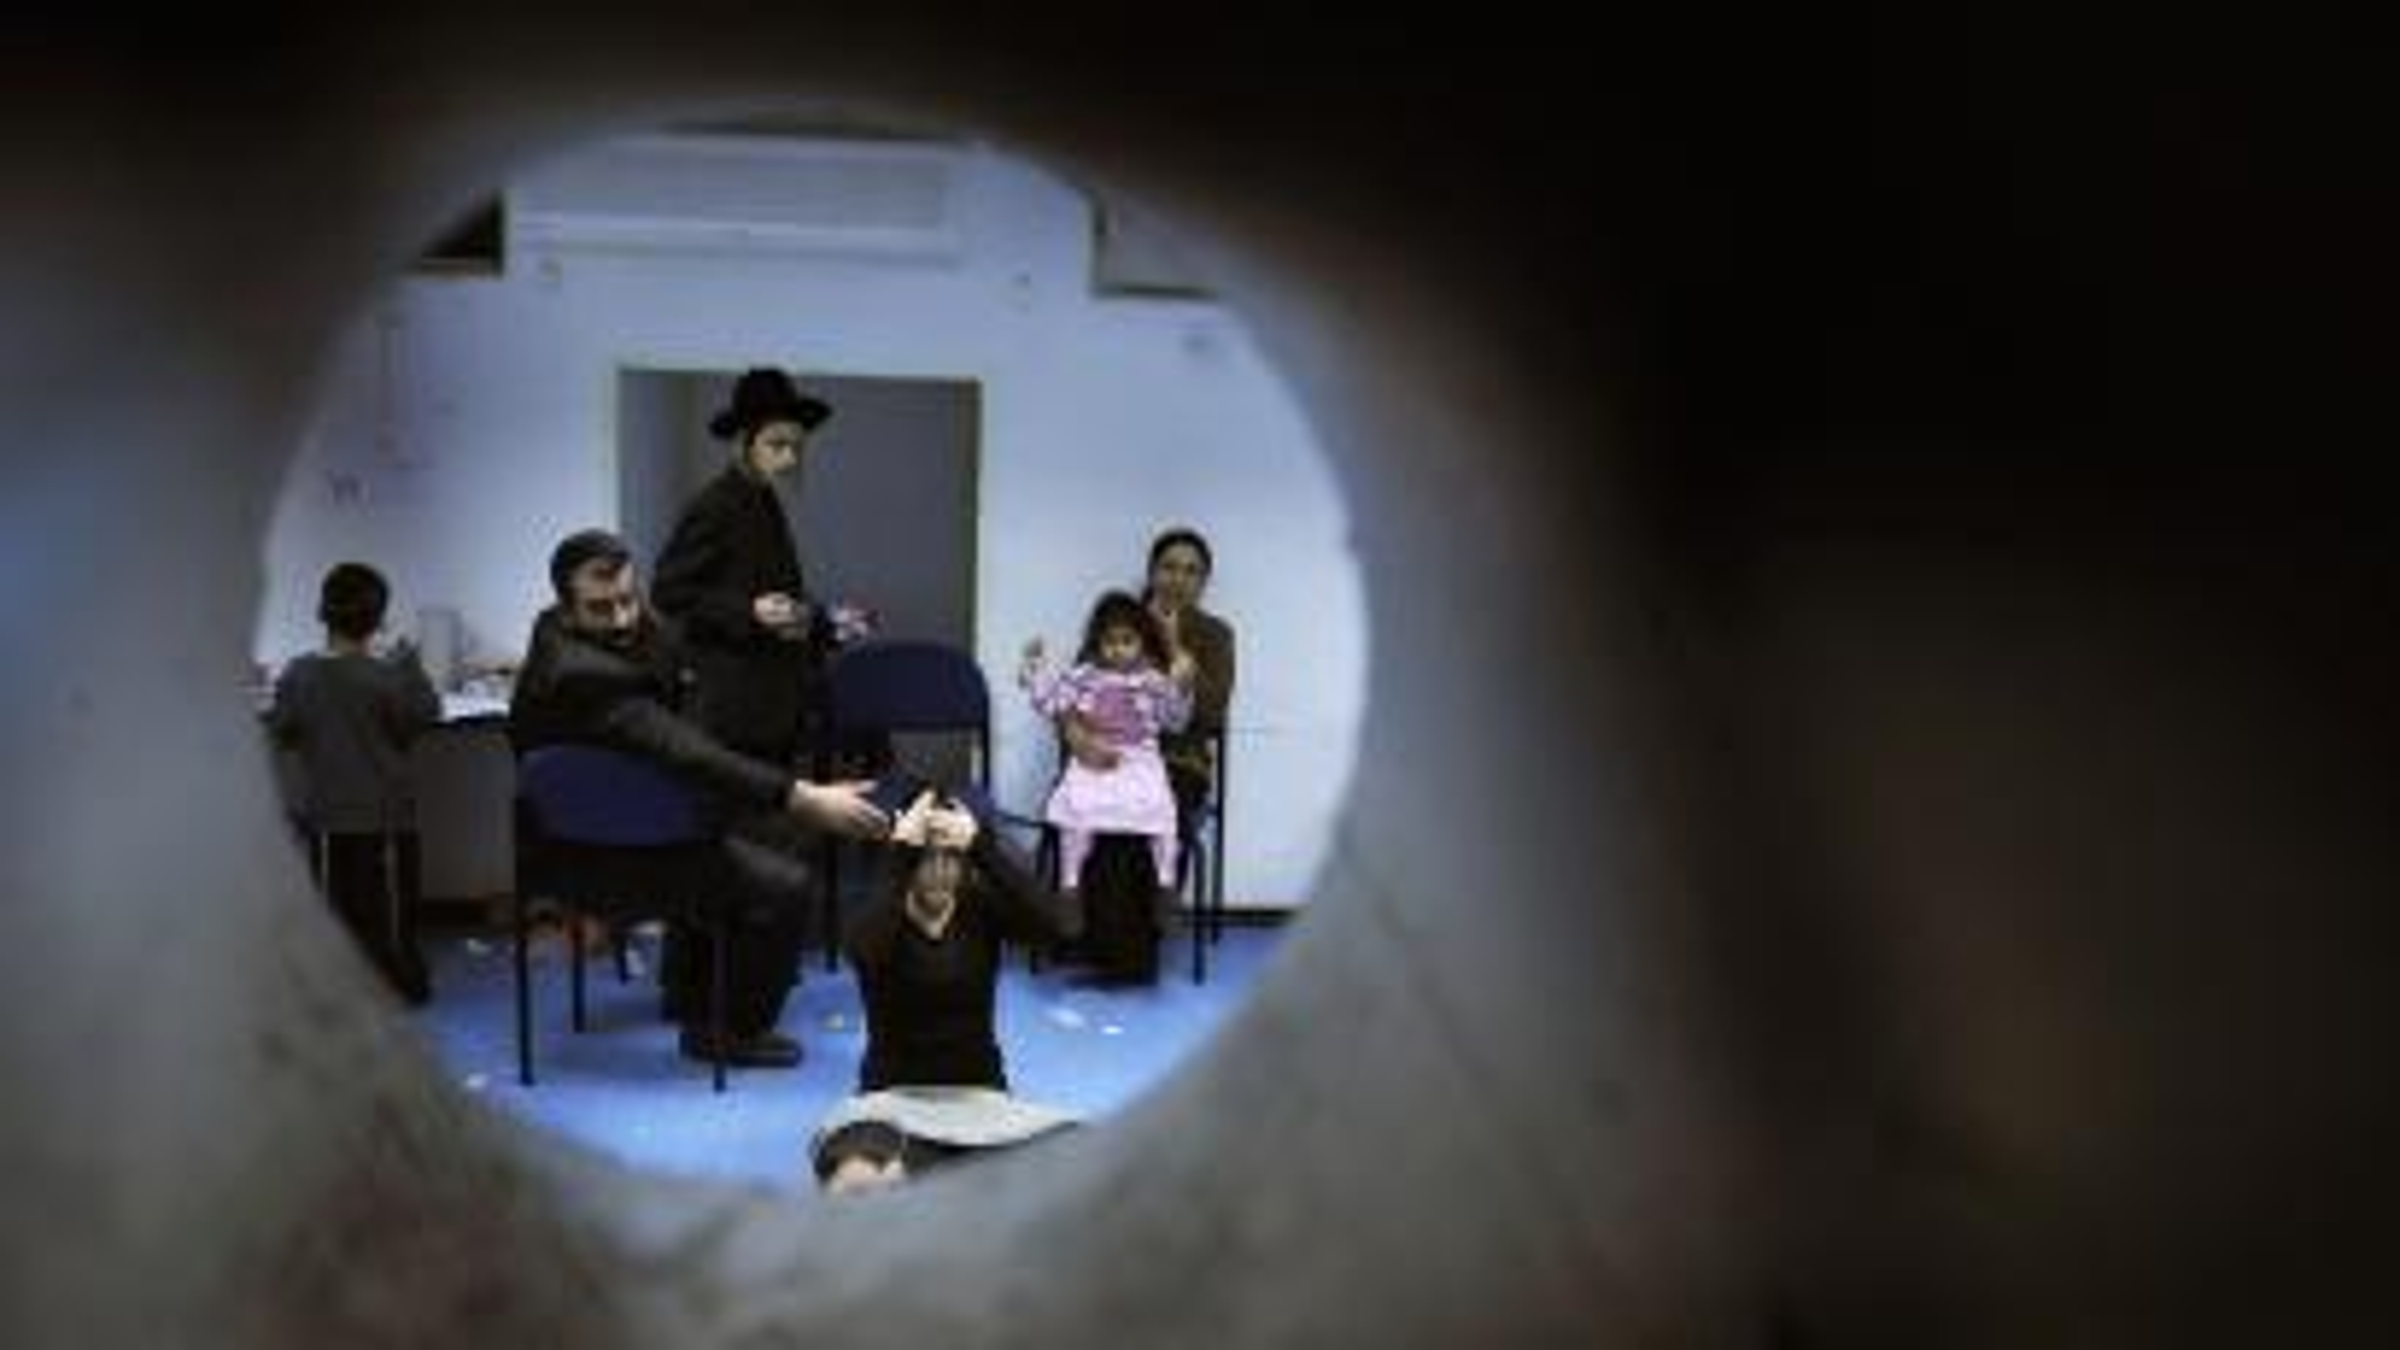 Israelis in bomb shelter